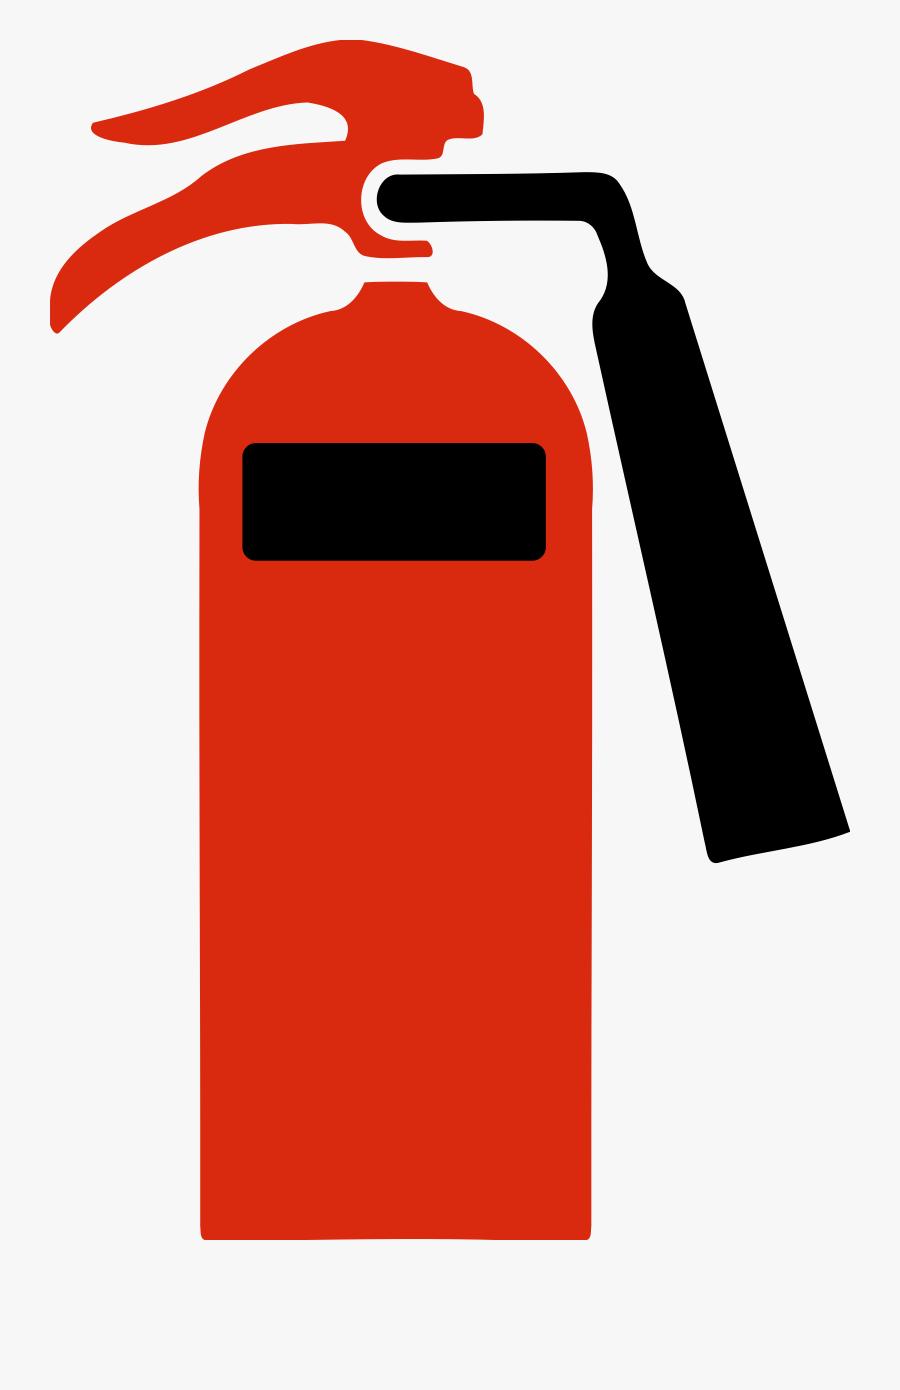 Fire Clipart Symbols - Clipart Fire Extinguisher Png, Transparent Clipart